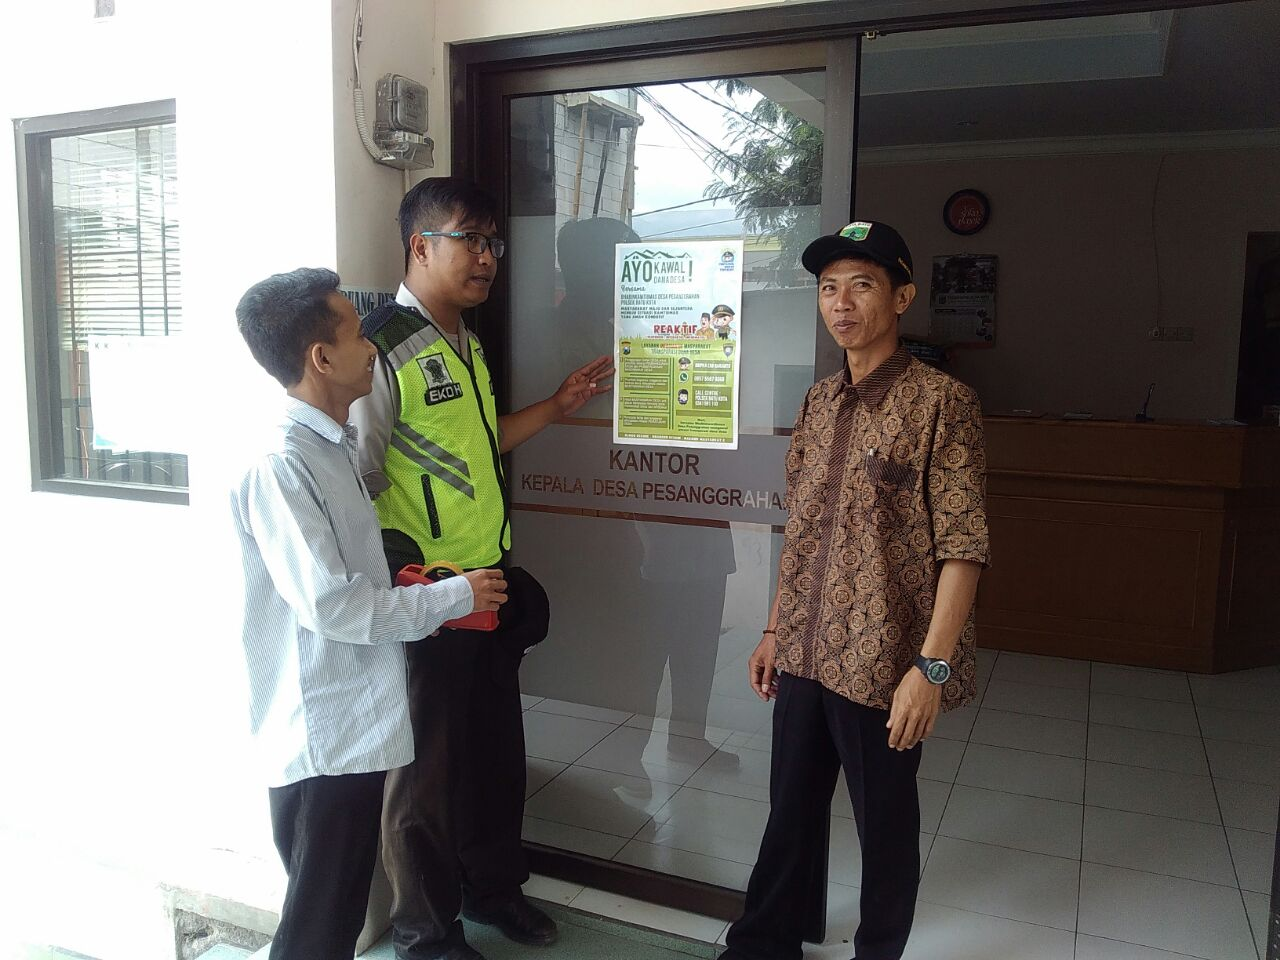 Anggota Bhabinkamtibmas Polsek Batu Kota Polres Batu Buka Call Center 110 Pelayanan Informatif Polres